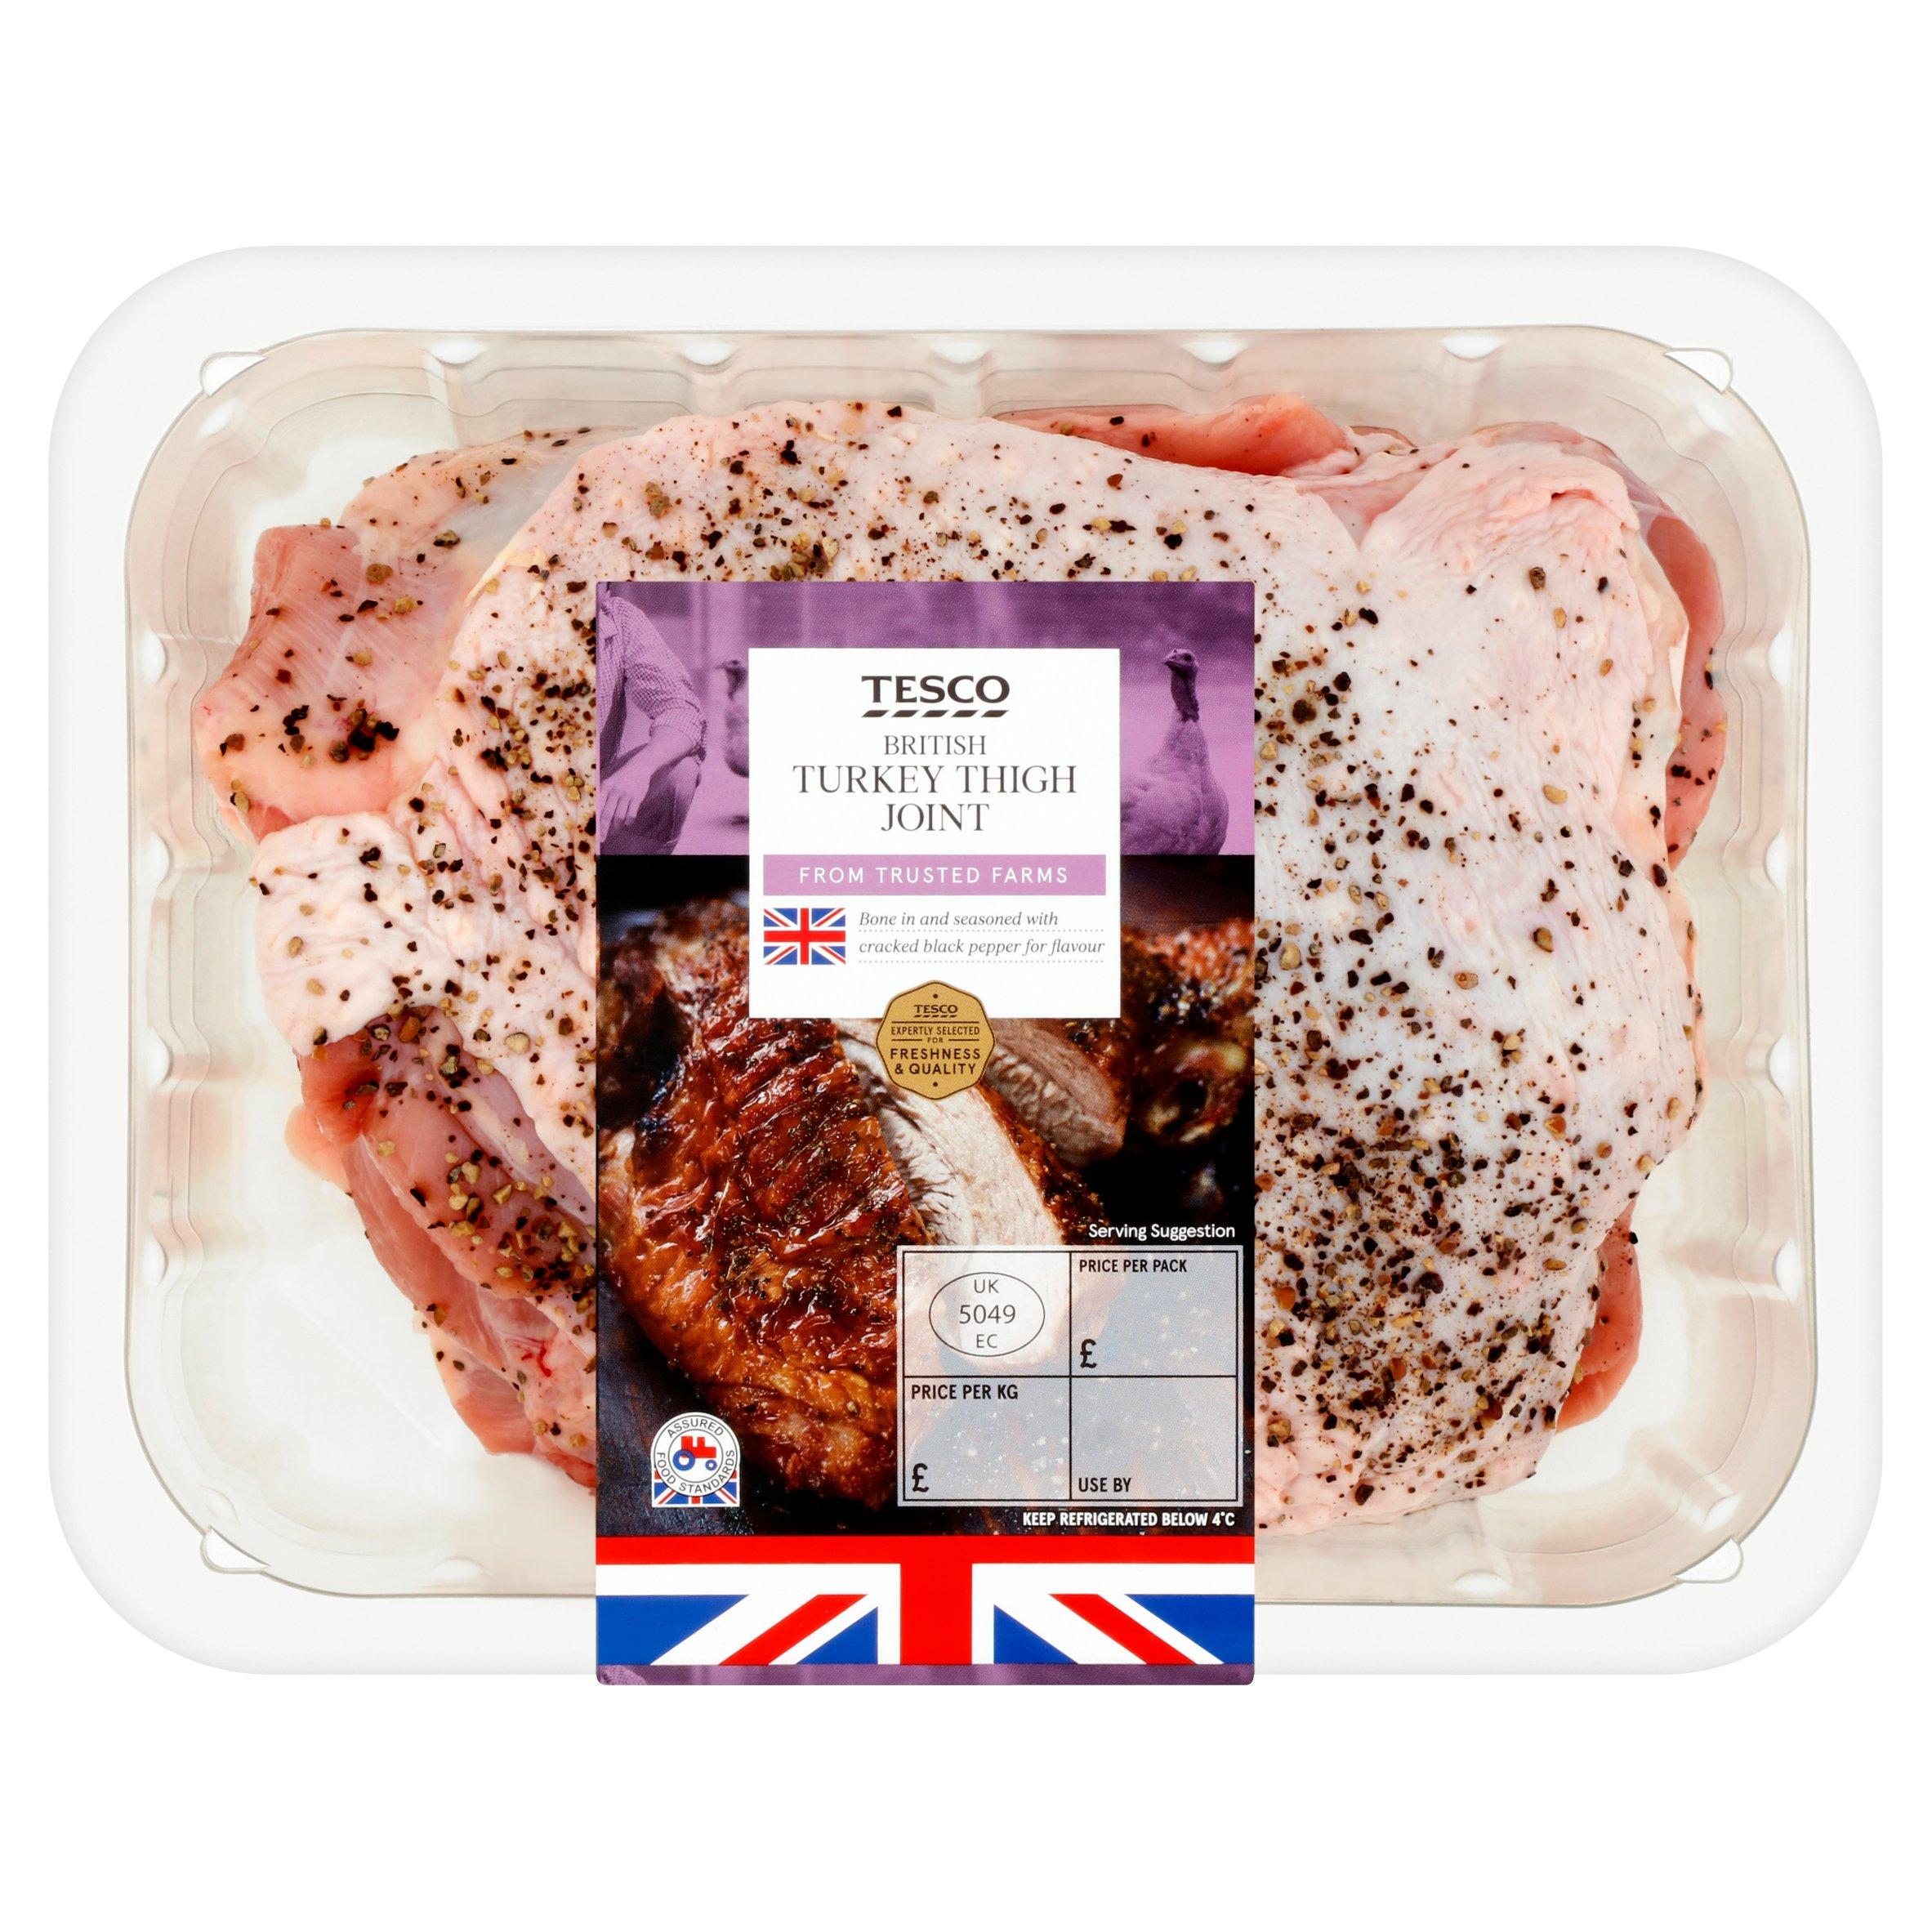 Tesco Turkey Bone In Thigh Joint 1.25Kg